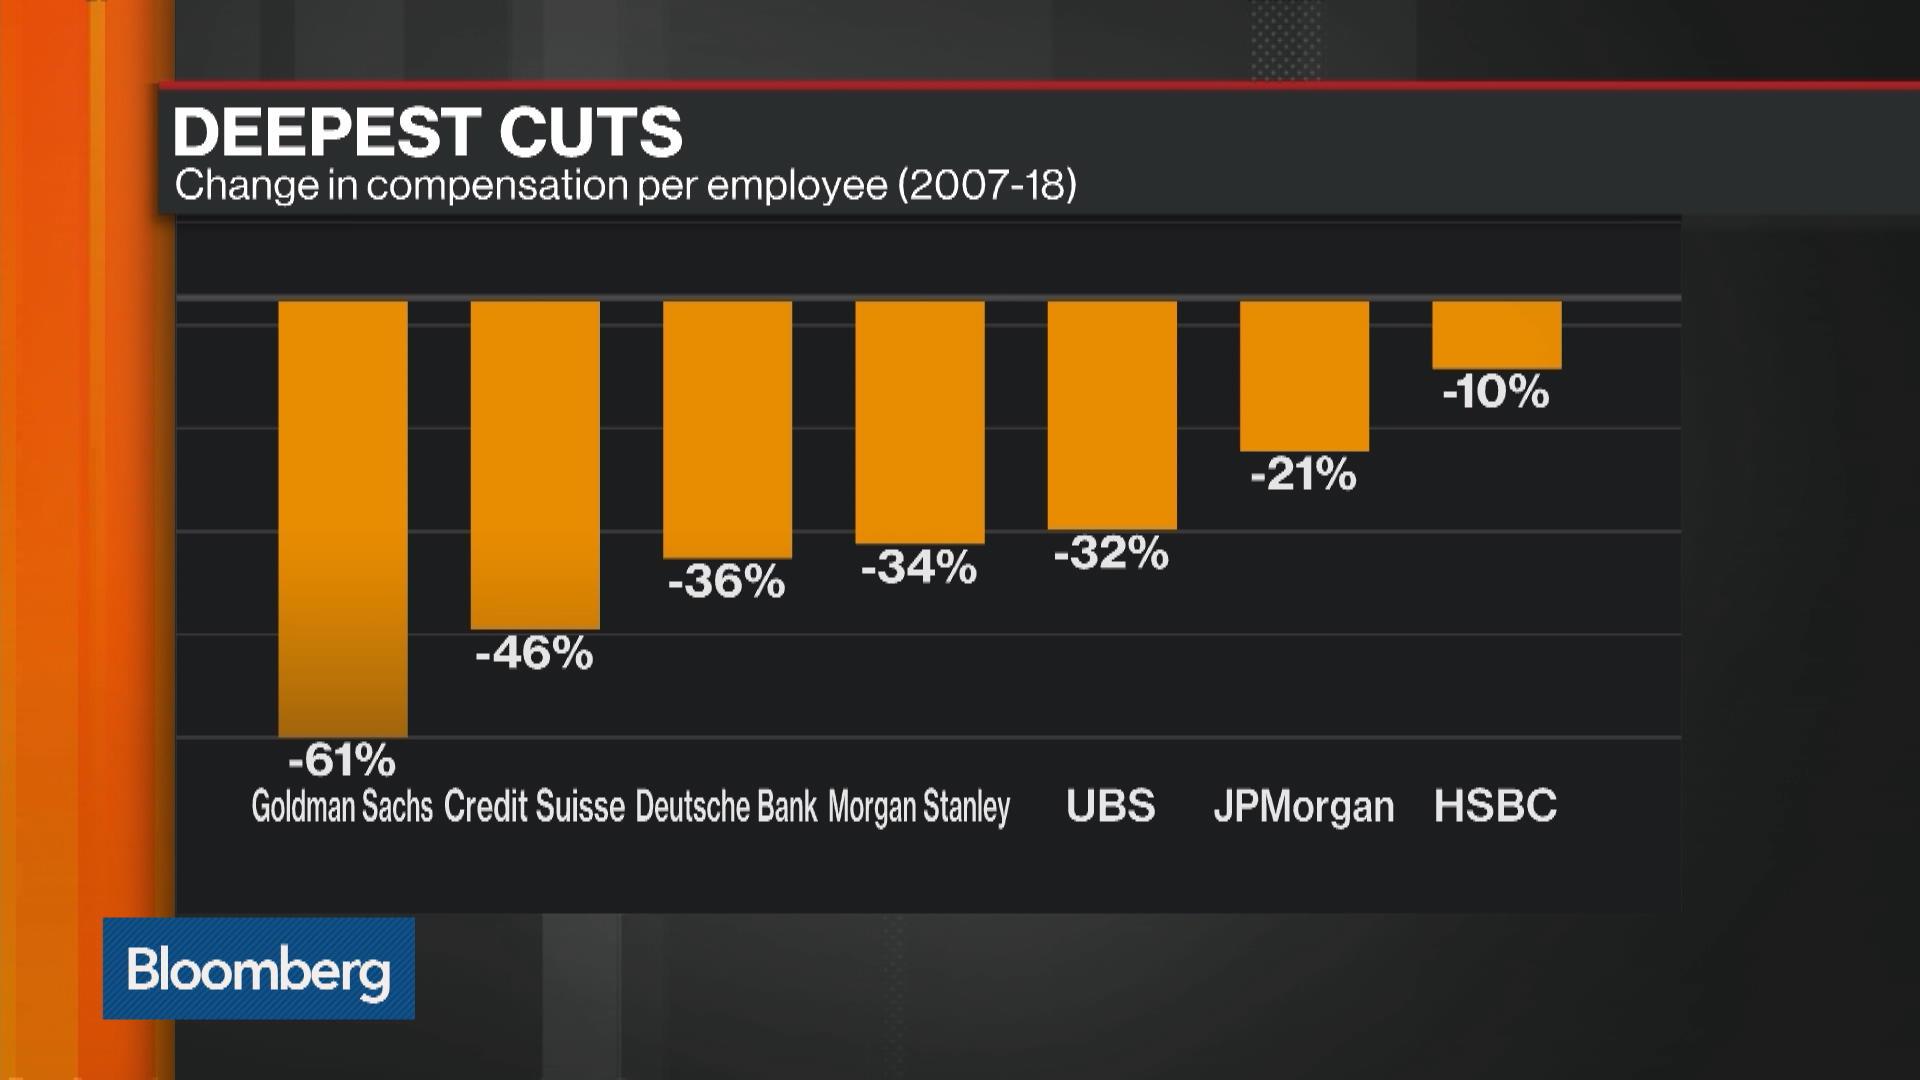 Goldman Sachs Leads Wall Street's Post-Crisis Pay Slump